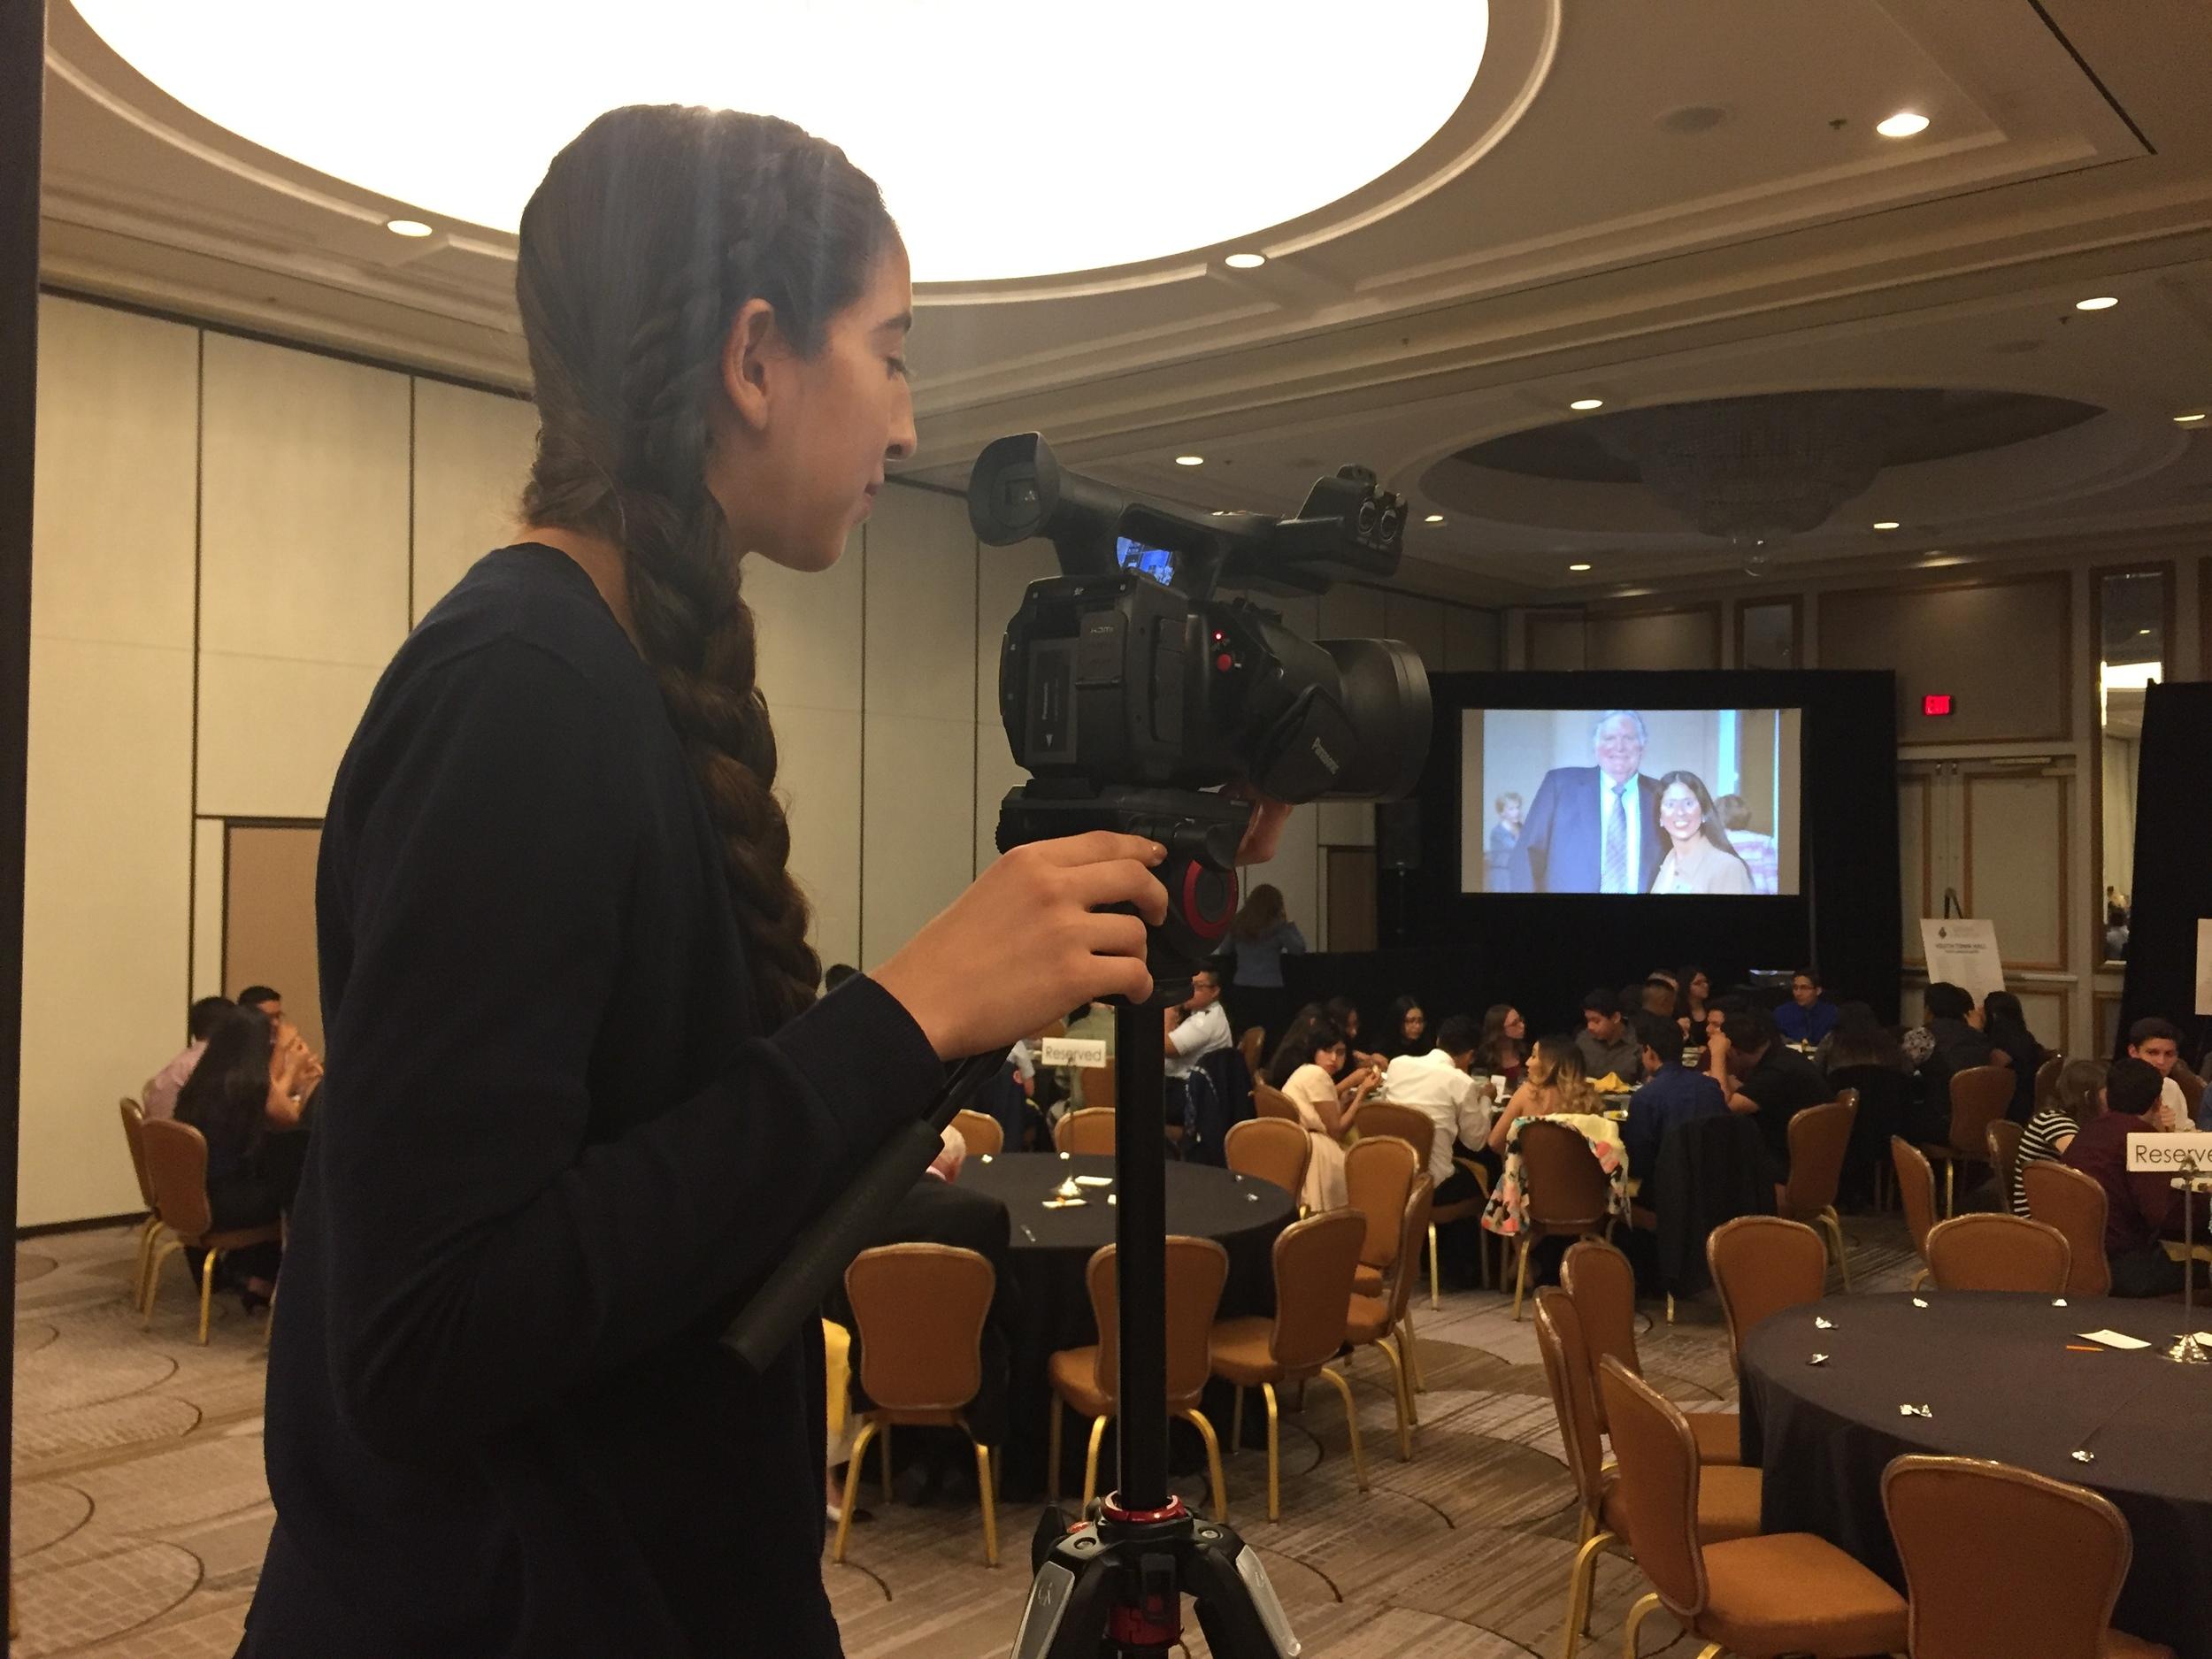 DATA Junior Jennifer Reynoso operates the main camera for David Petraeus' Youth Town Hall.